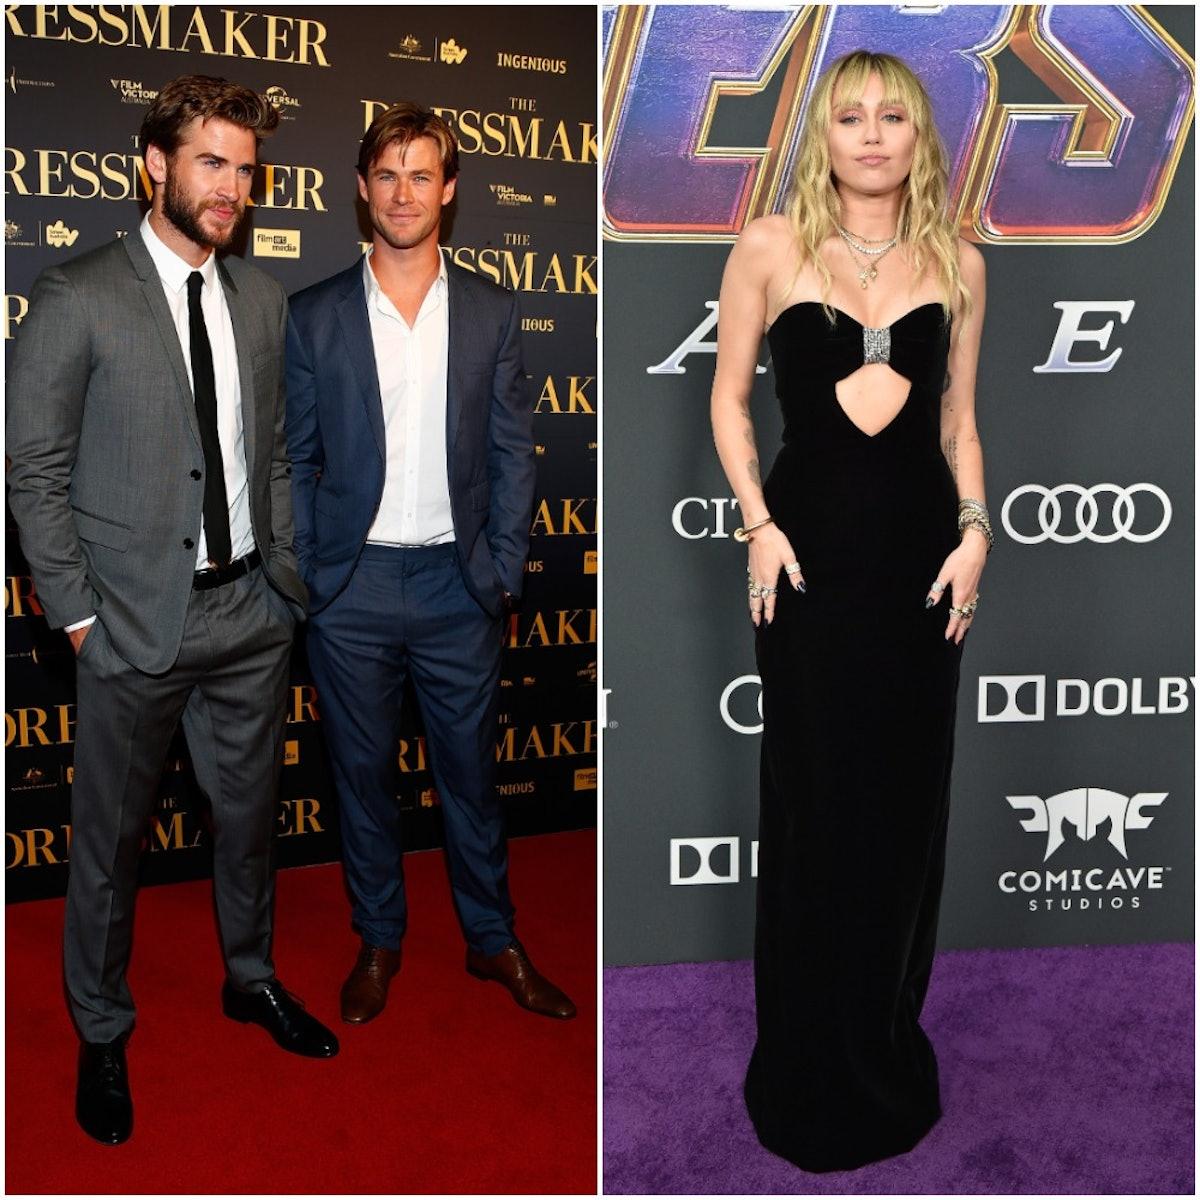 Liam Hemsworth, Chris Hemsworth, Miley Cyrus